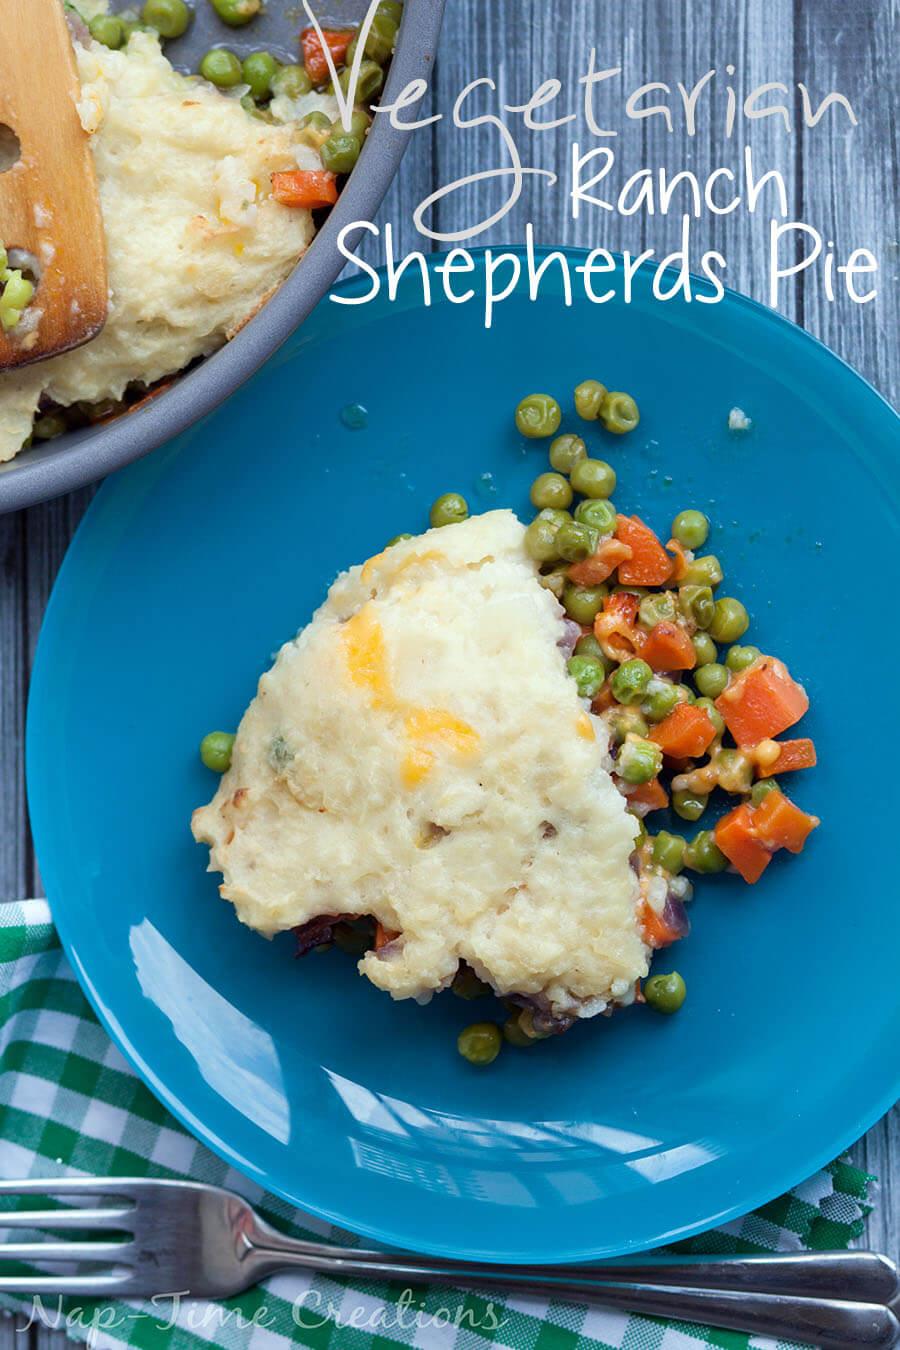 vegetairan ranch shepherds pie 3